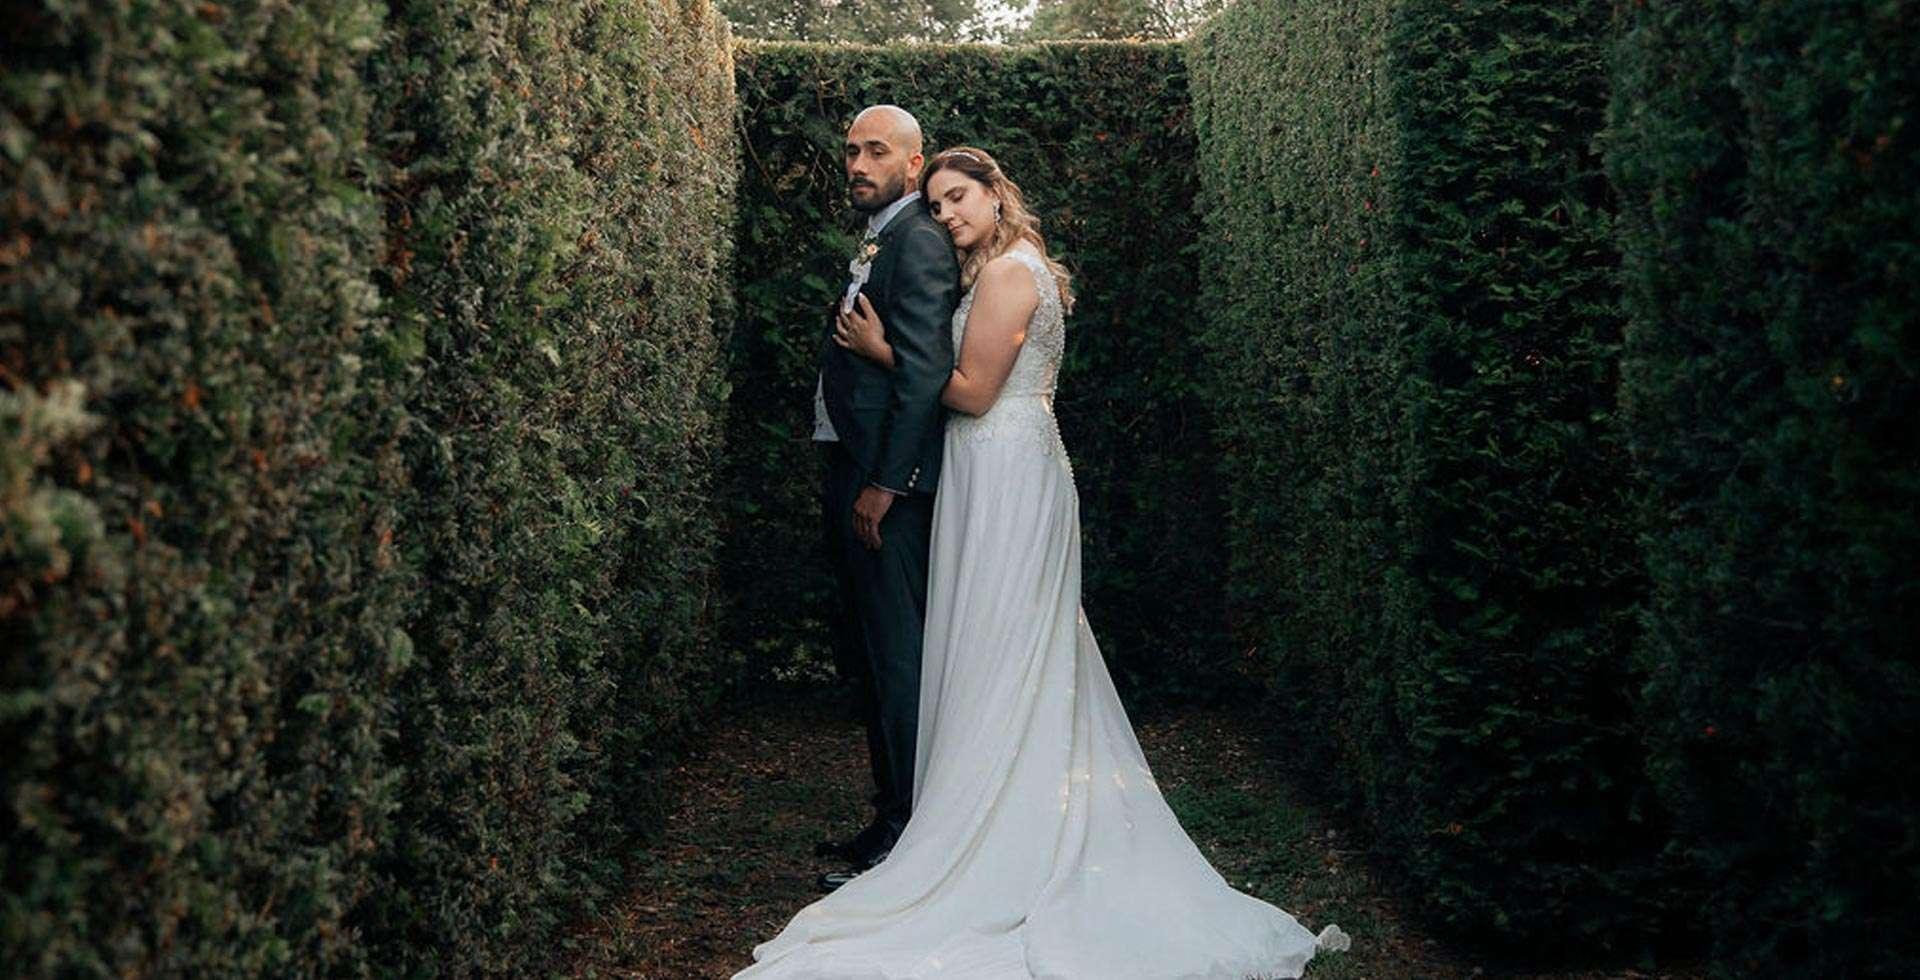 Matrimonio al Parco Giardino Sigurtà